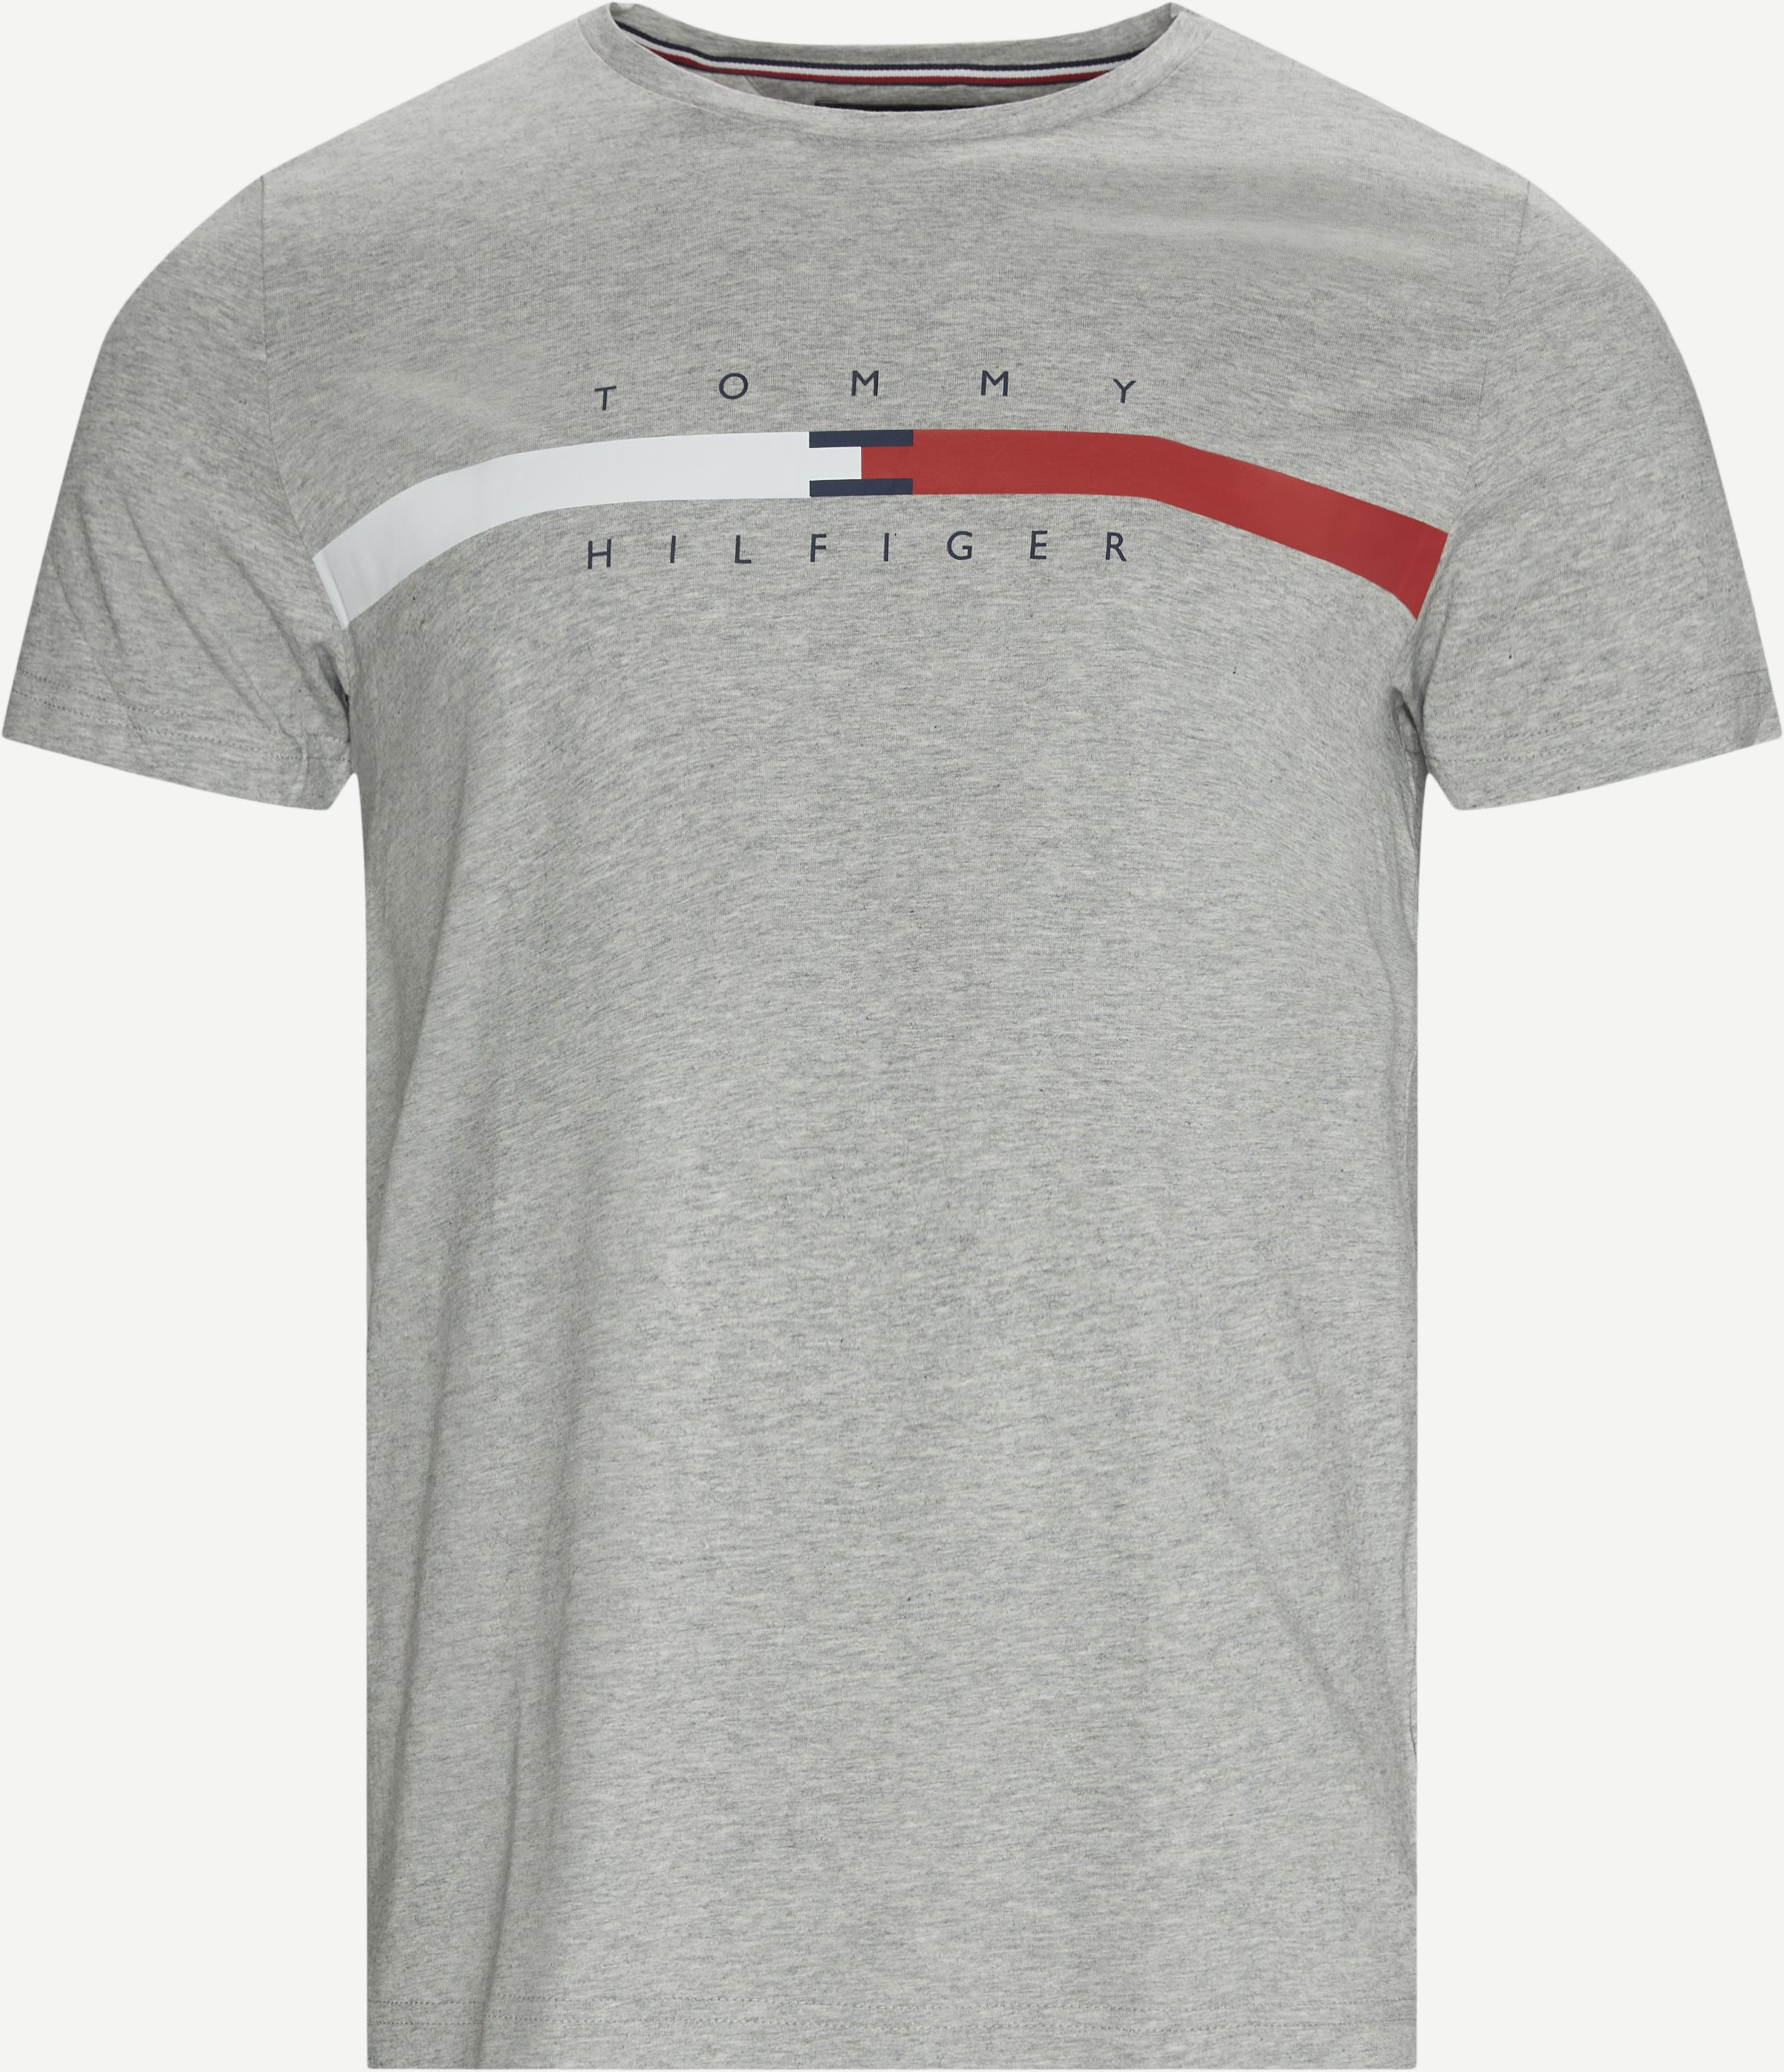 T-Shirts - Regular - Grau